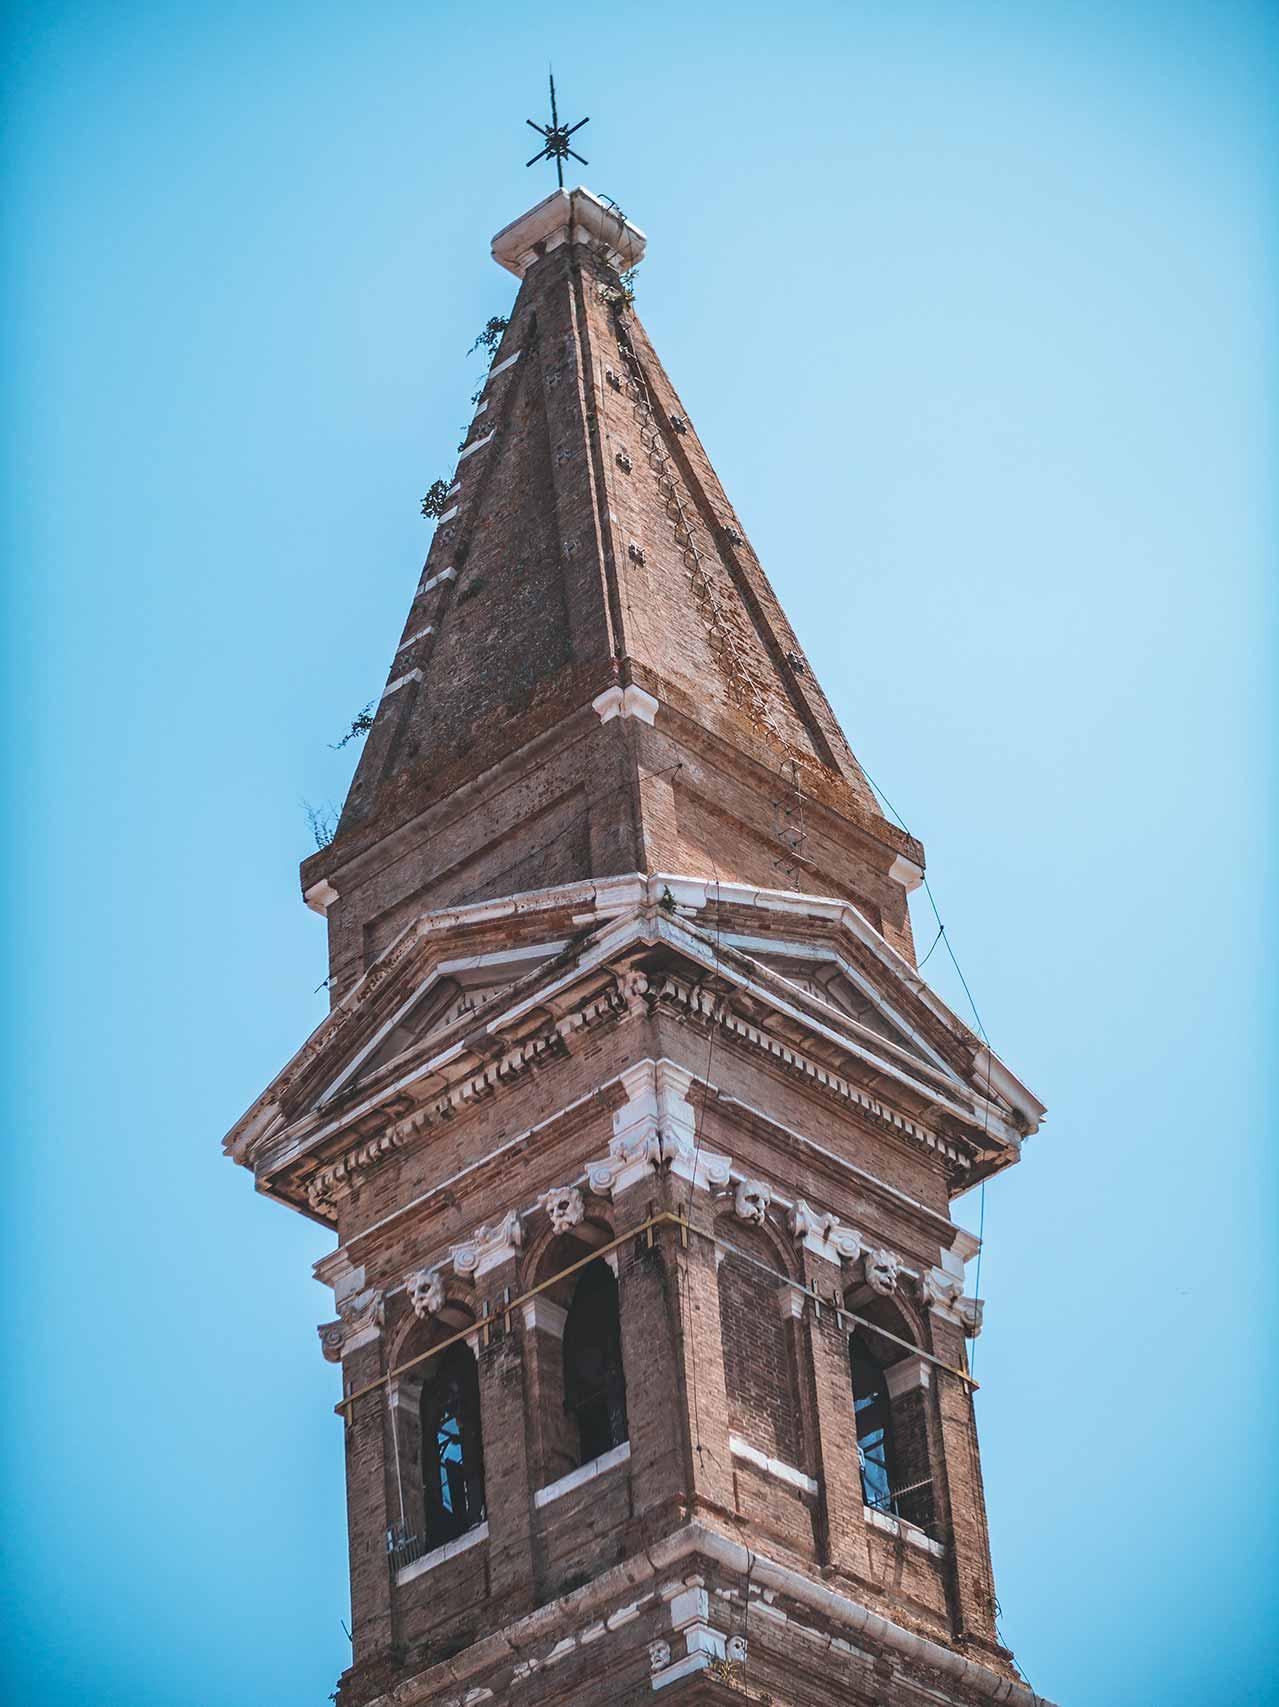 Martino Kirche - der schiefe Turm von Burano